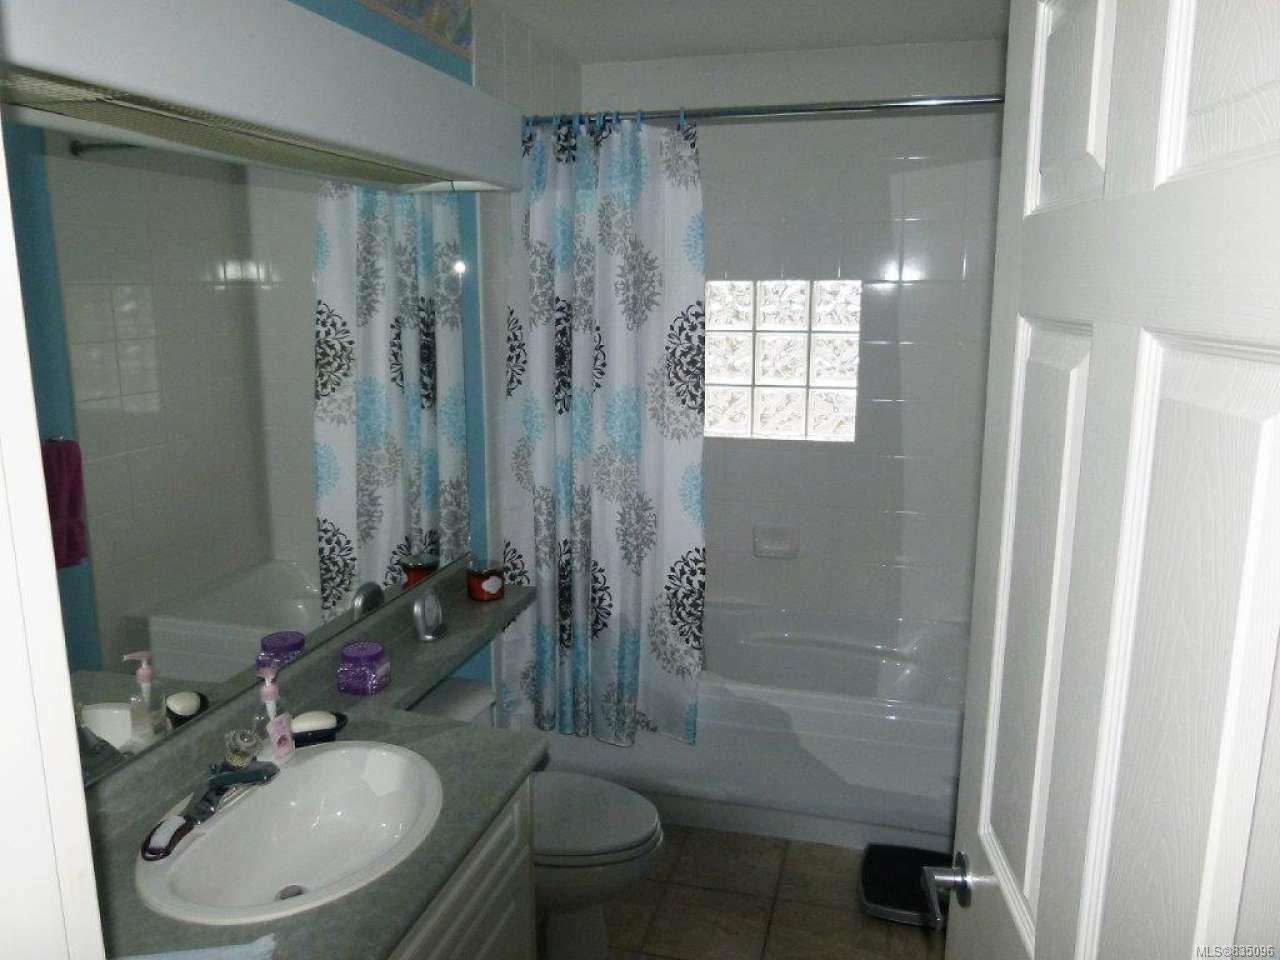 Photo 24: Photos: 2025 Bowen Rd in NANAIMO: Na Central Nanaimo Mixed Use for sale (Nanaimo)  : MLS®# 835096